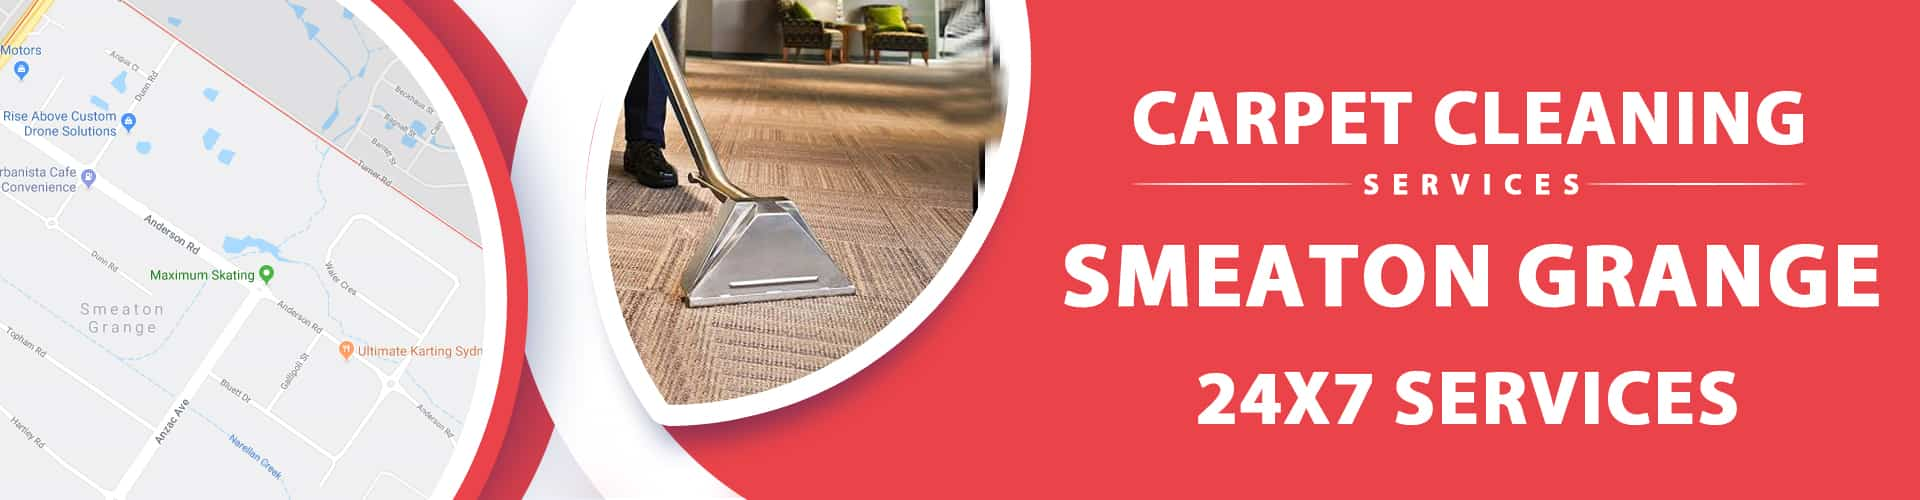 Carpet Cleaning Smeaton Grange